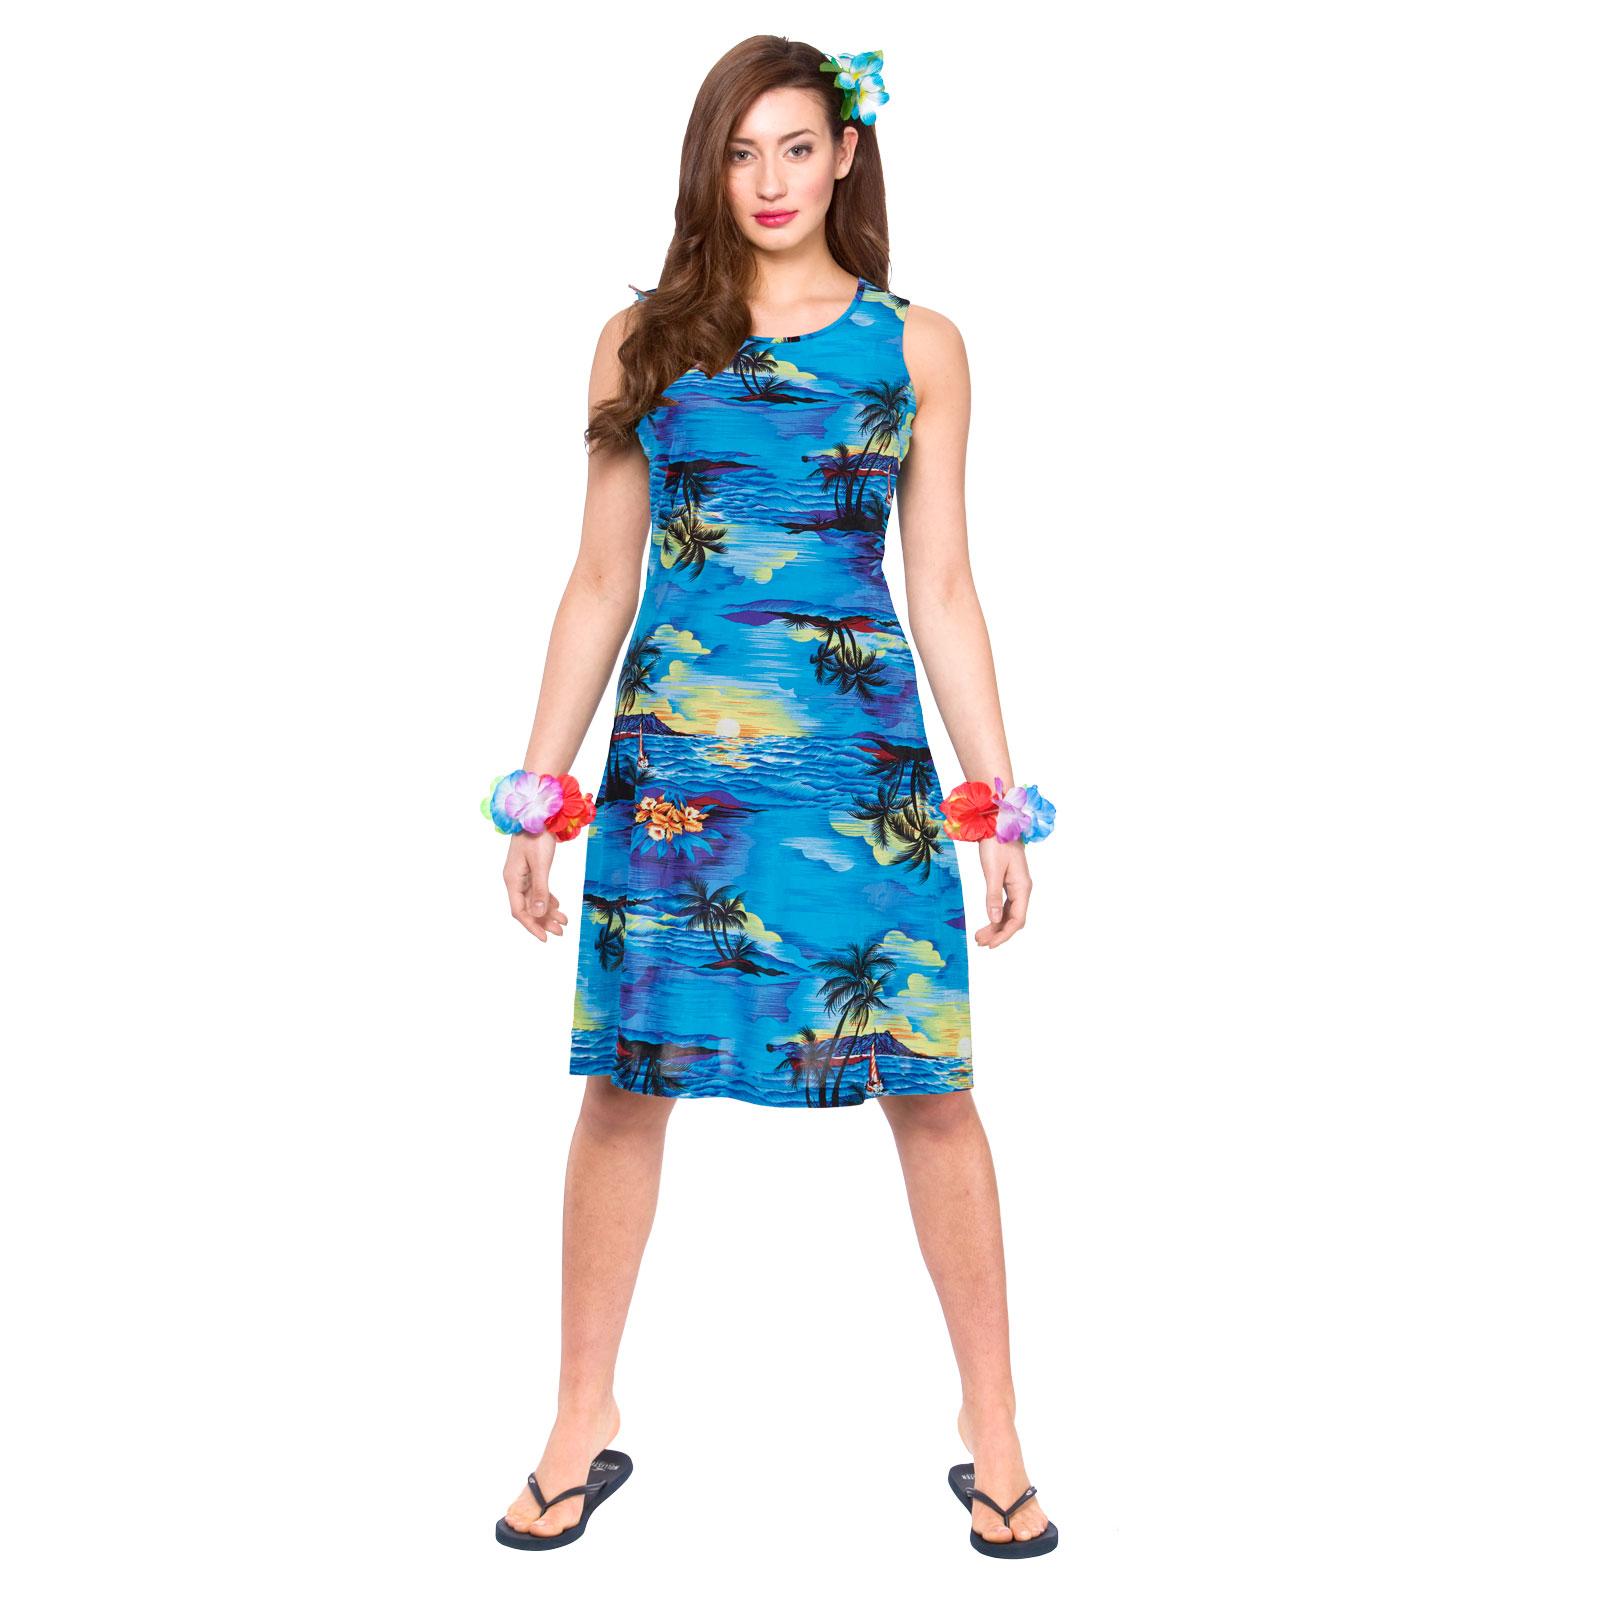 Ladies Blue Palm Dress Hawaiian Luau Fancy Dress Up BBQ Party Costume Outfit | eBay